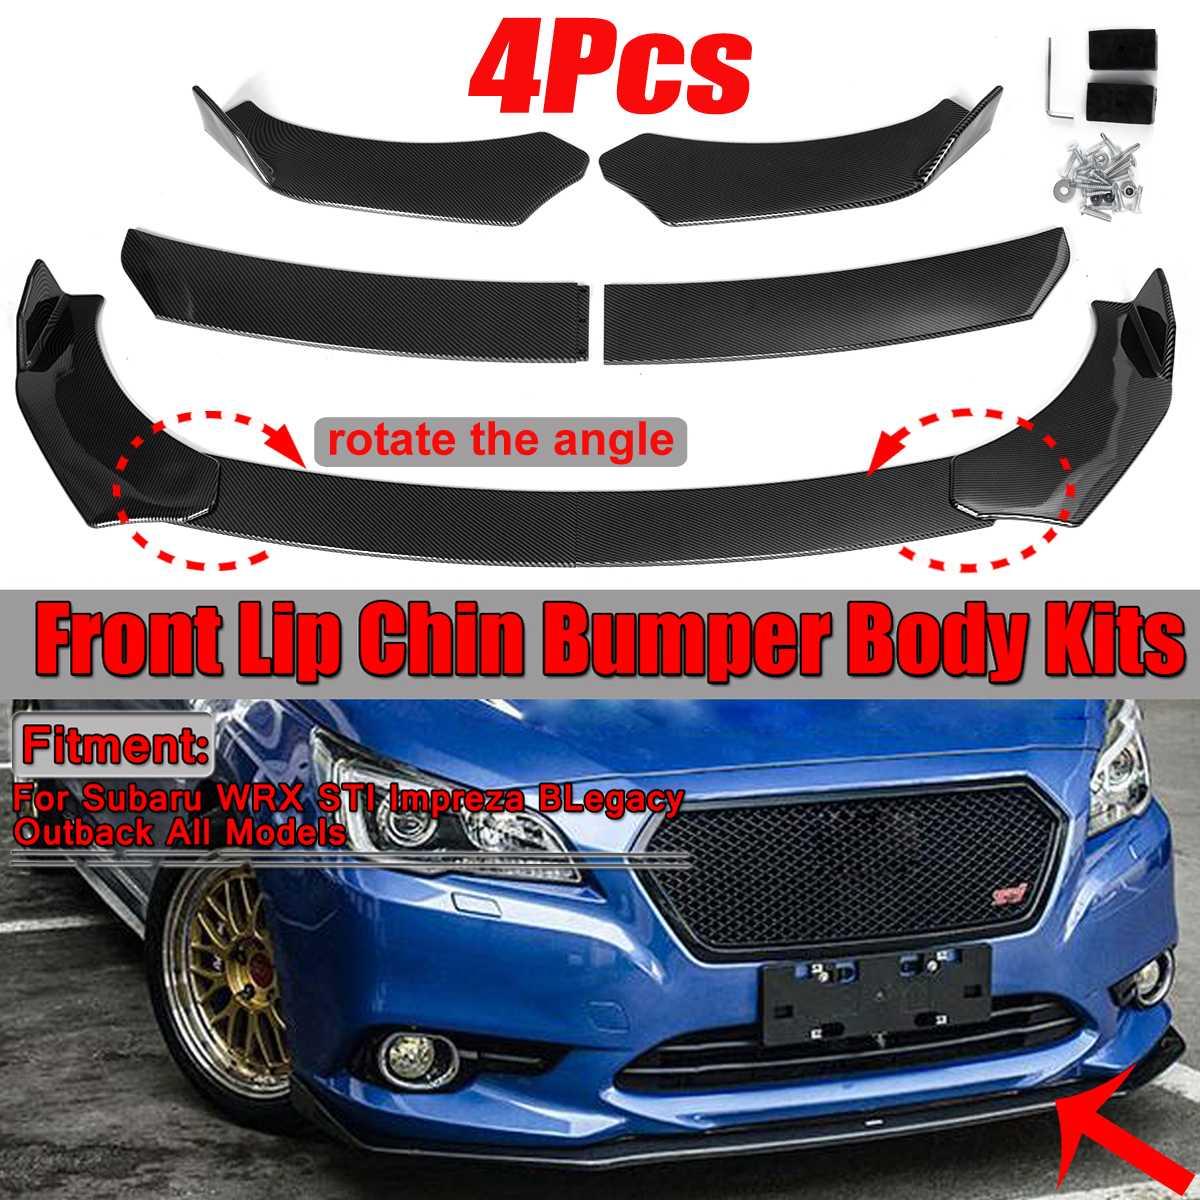 4 шт., автомобильный передний бампер для губ, сплиттер для подбородка, наборы для тела, бампер для губ, дефлектор для Subaru WRX STI Impreza BRZ Legacy Outback All